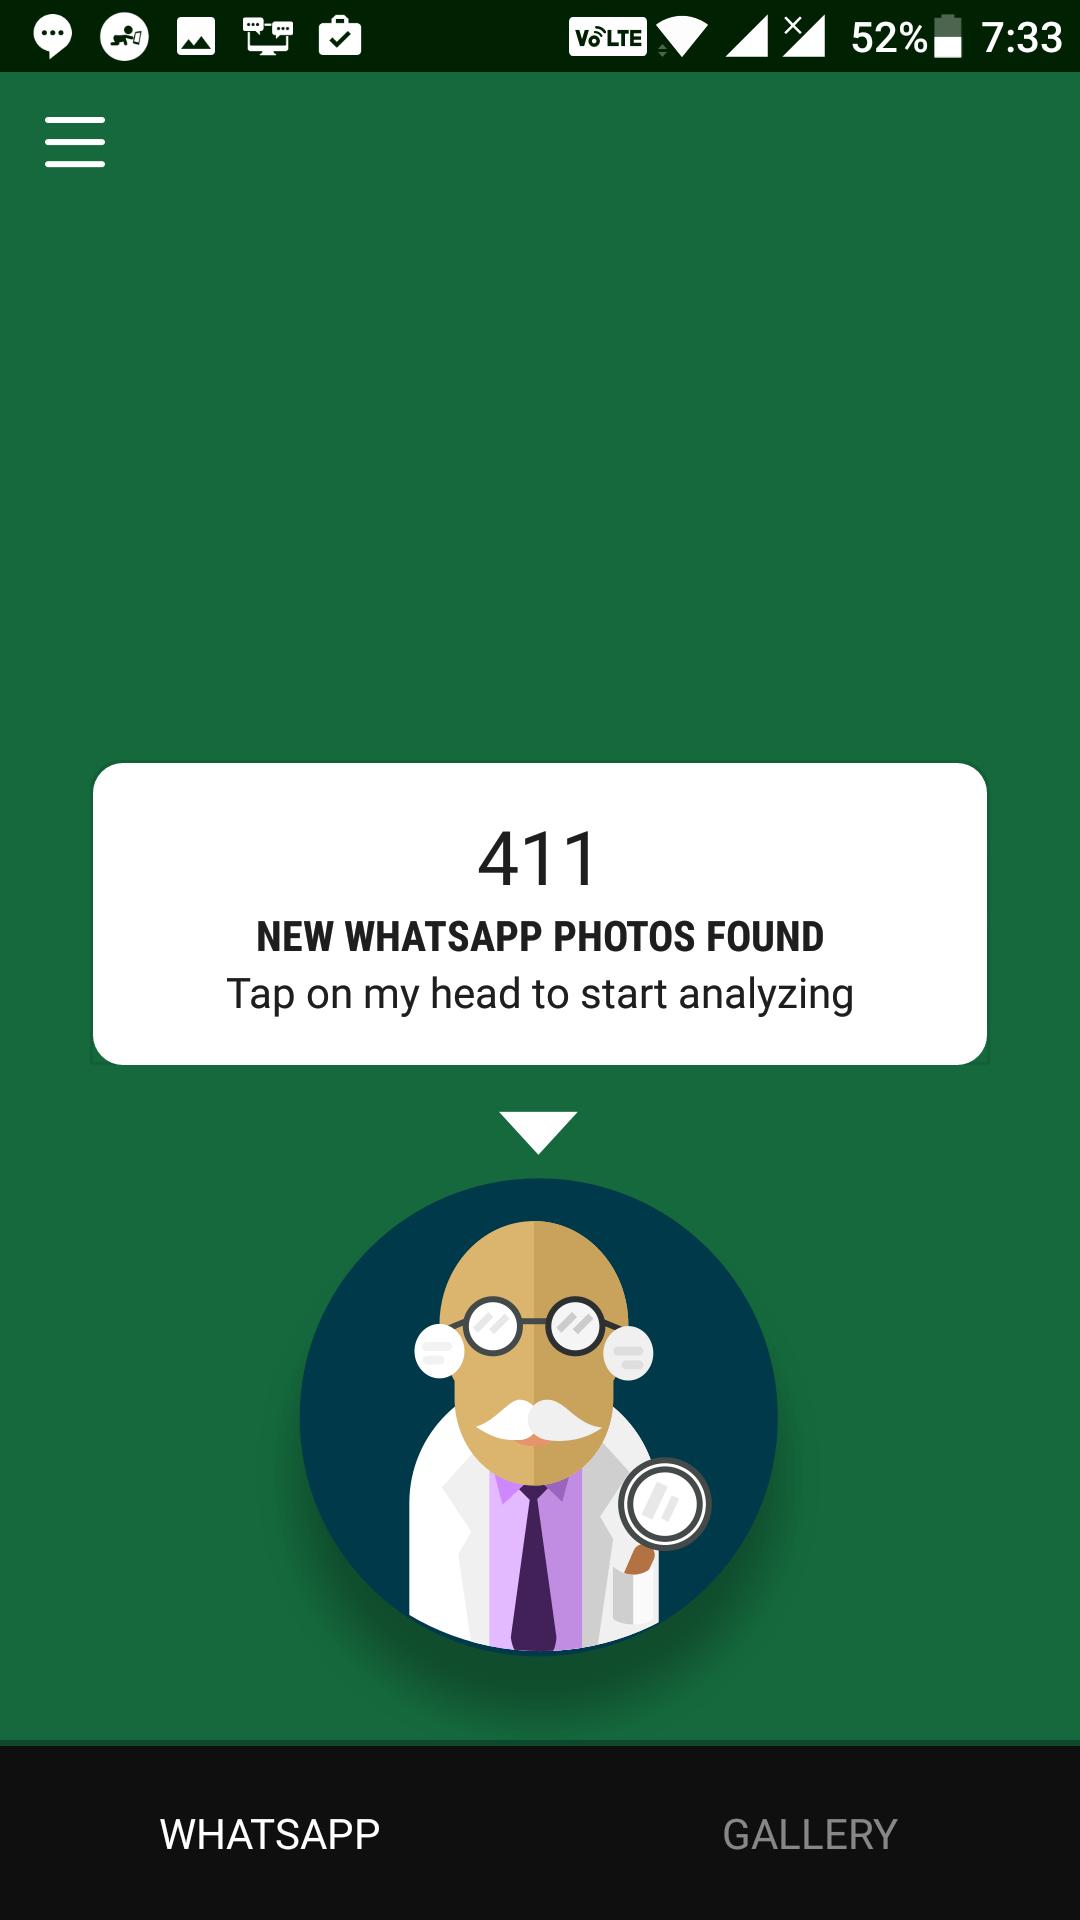 remove-old-whatsapp-photos-start